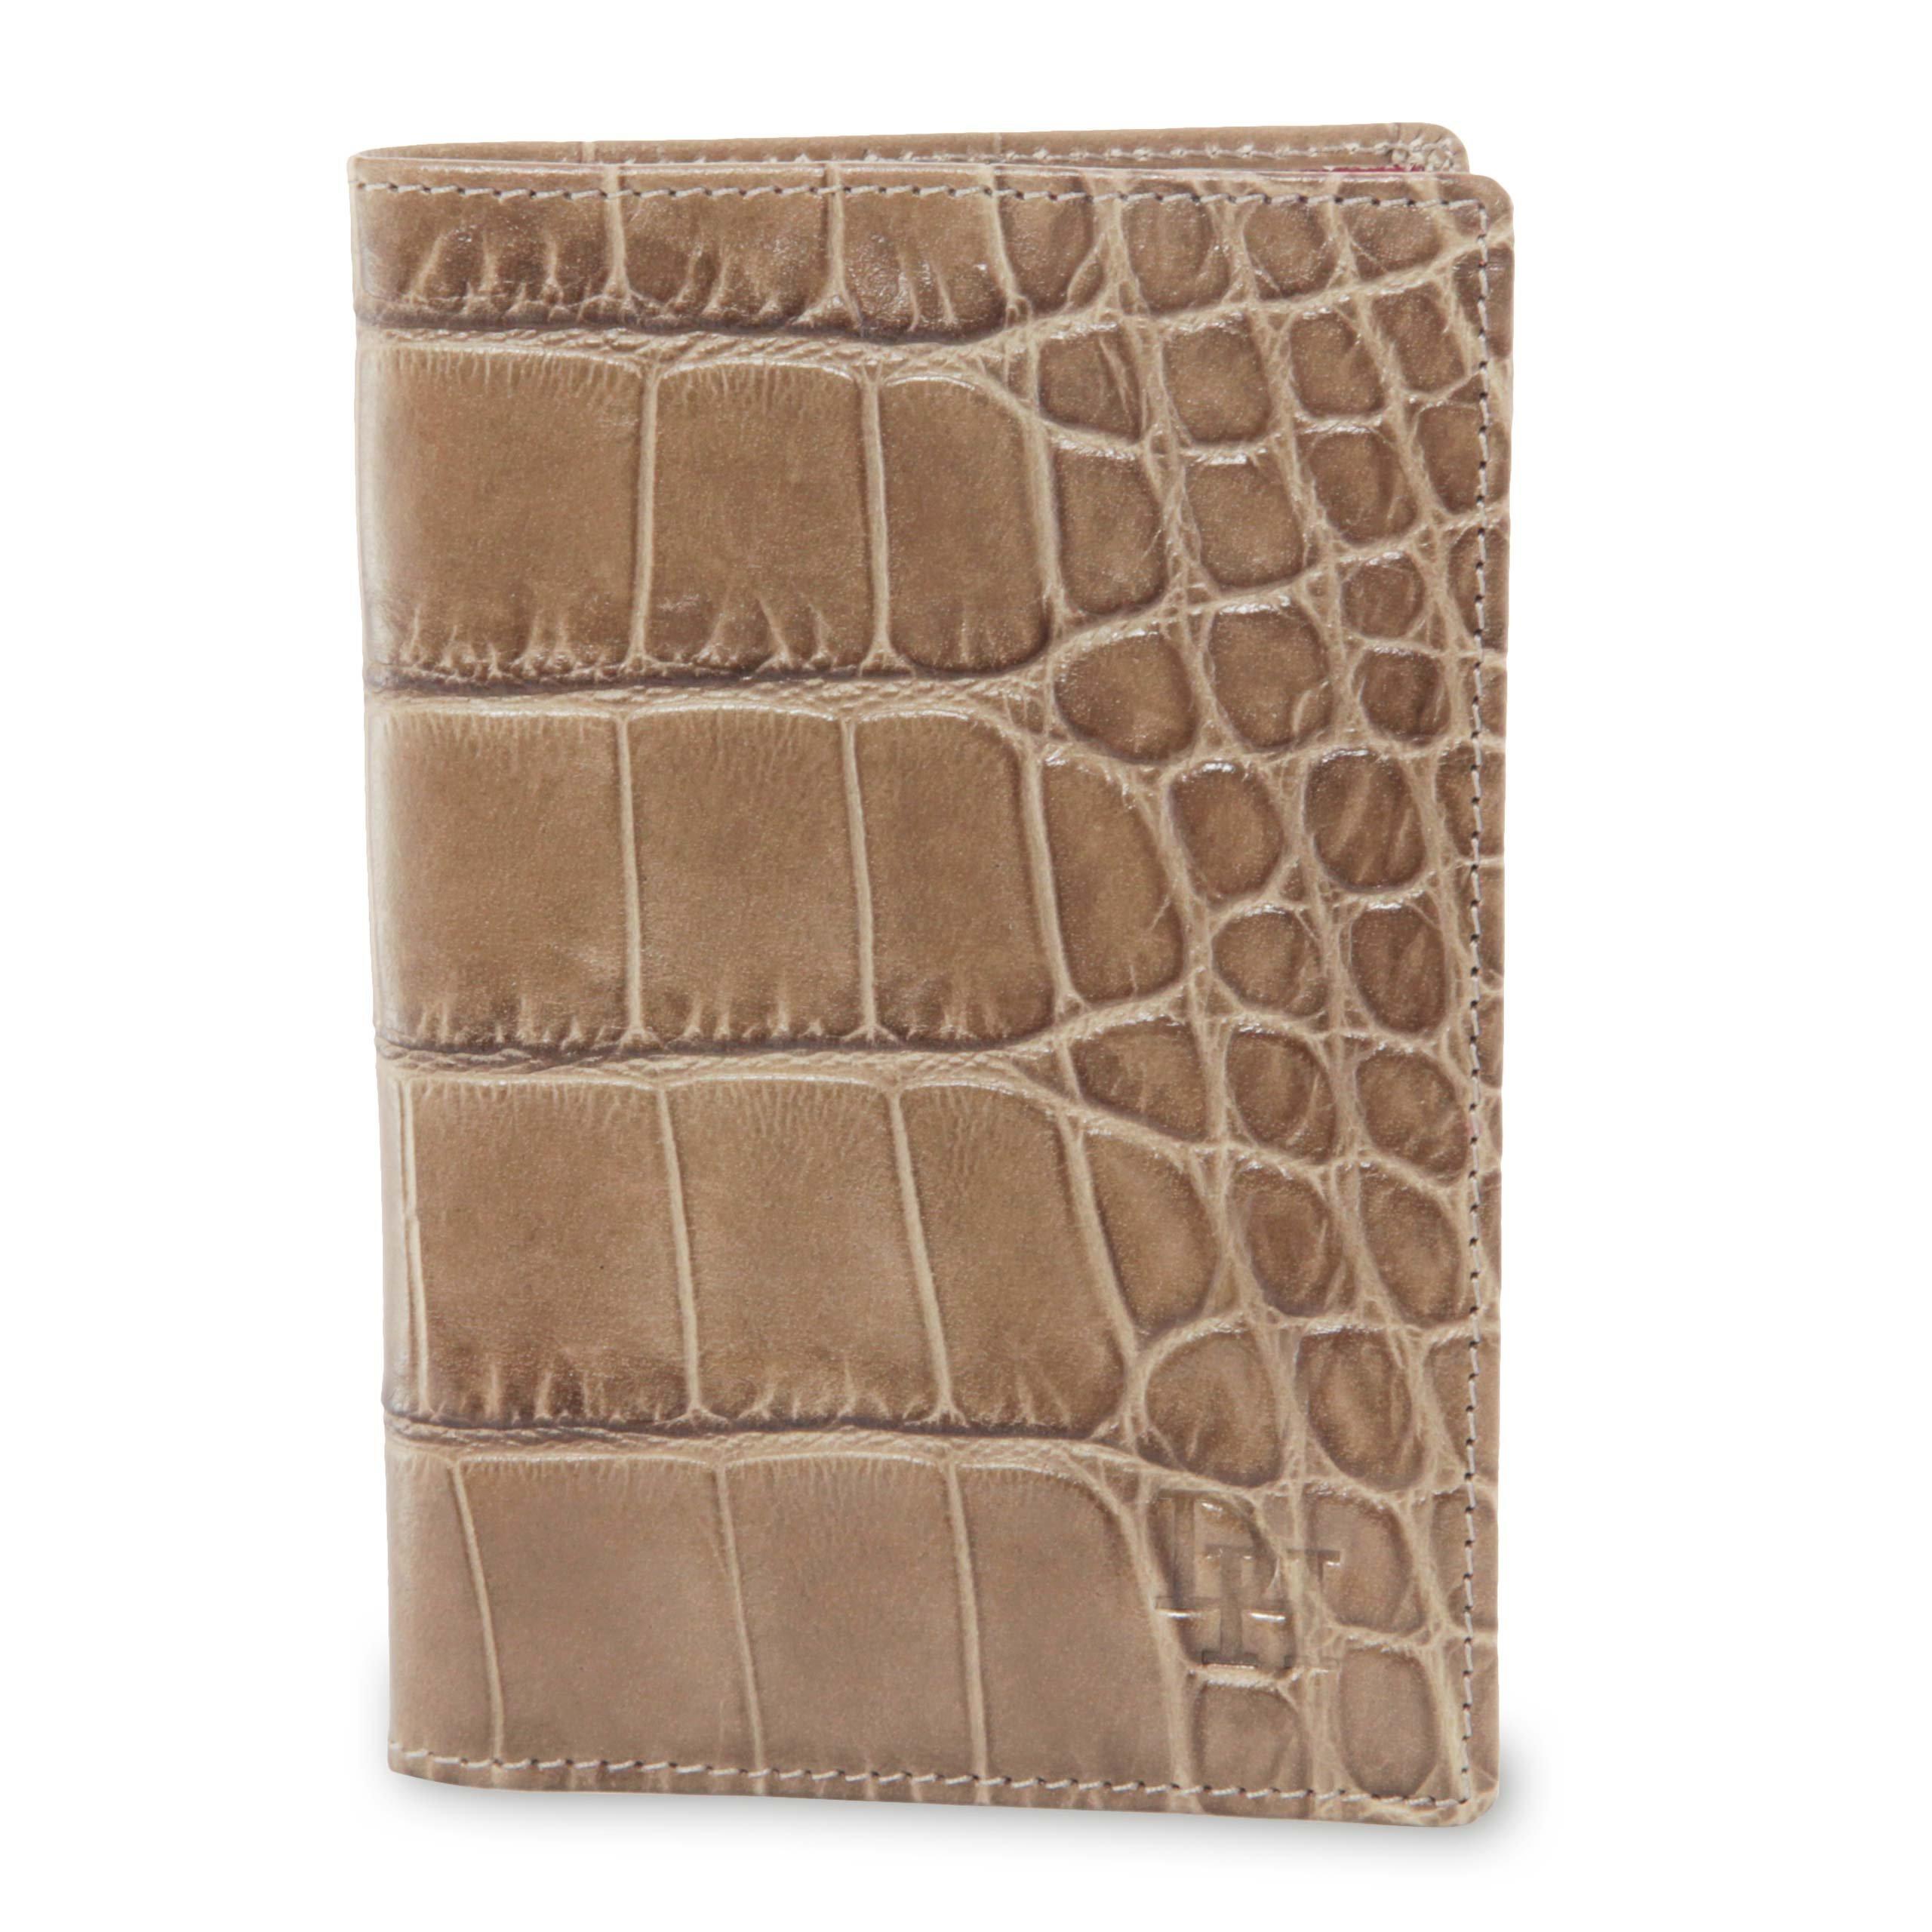 David Hampton Serengeti Crocodile Print Leather Passport Holder